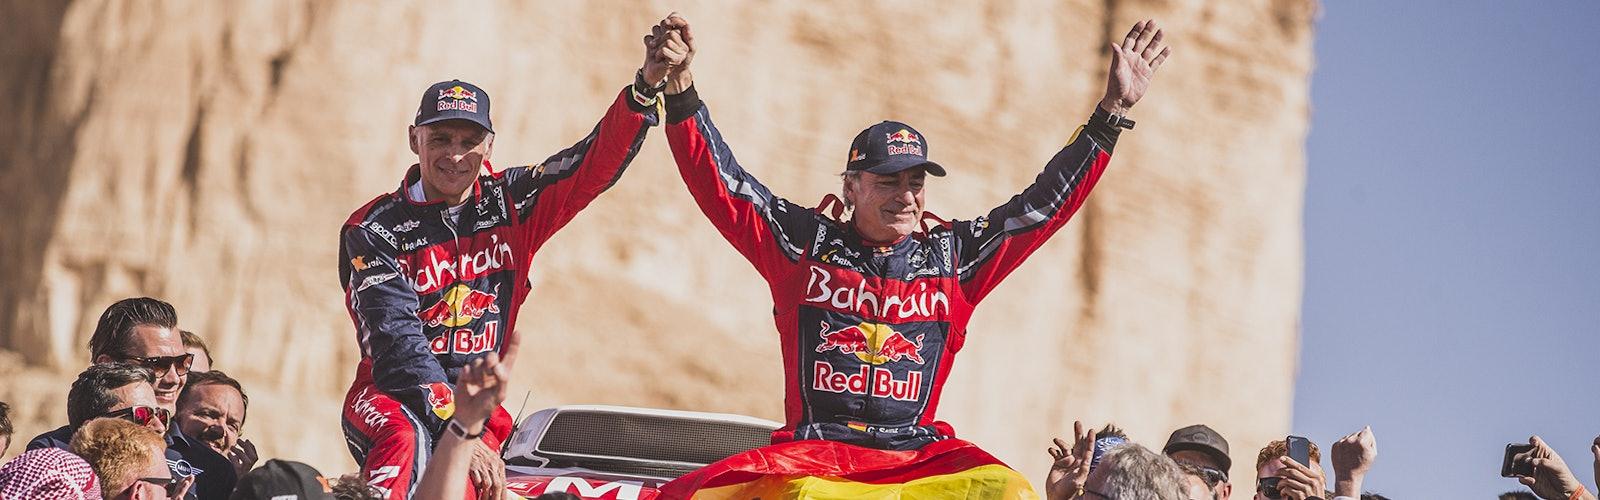 Carlos Sainz wins Dakar Rally 2020